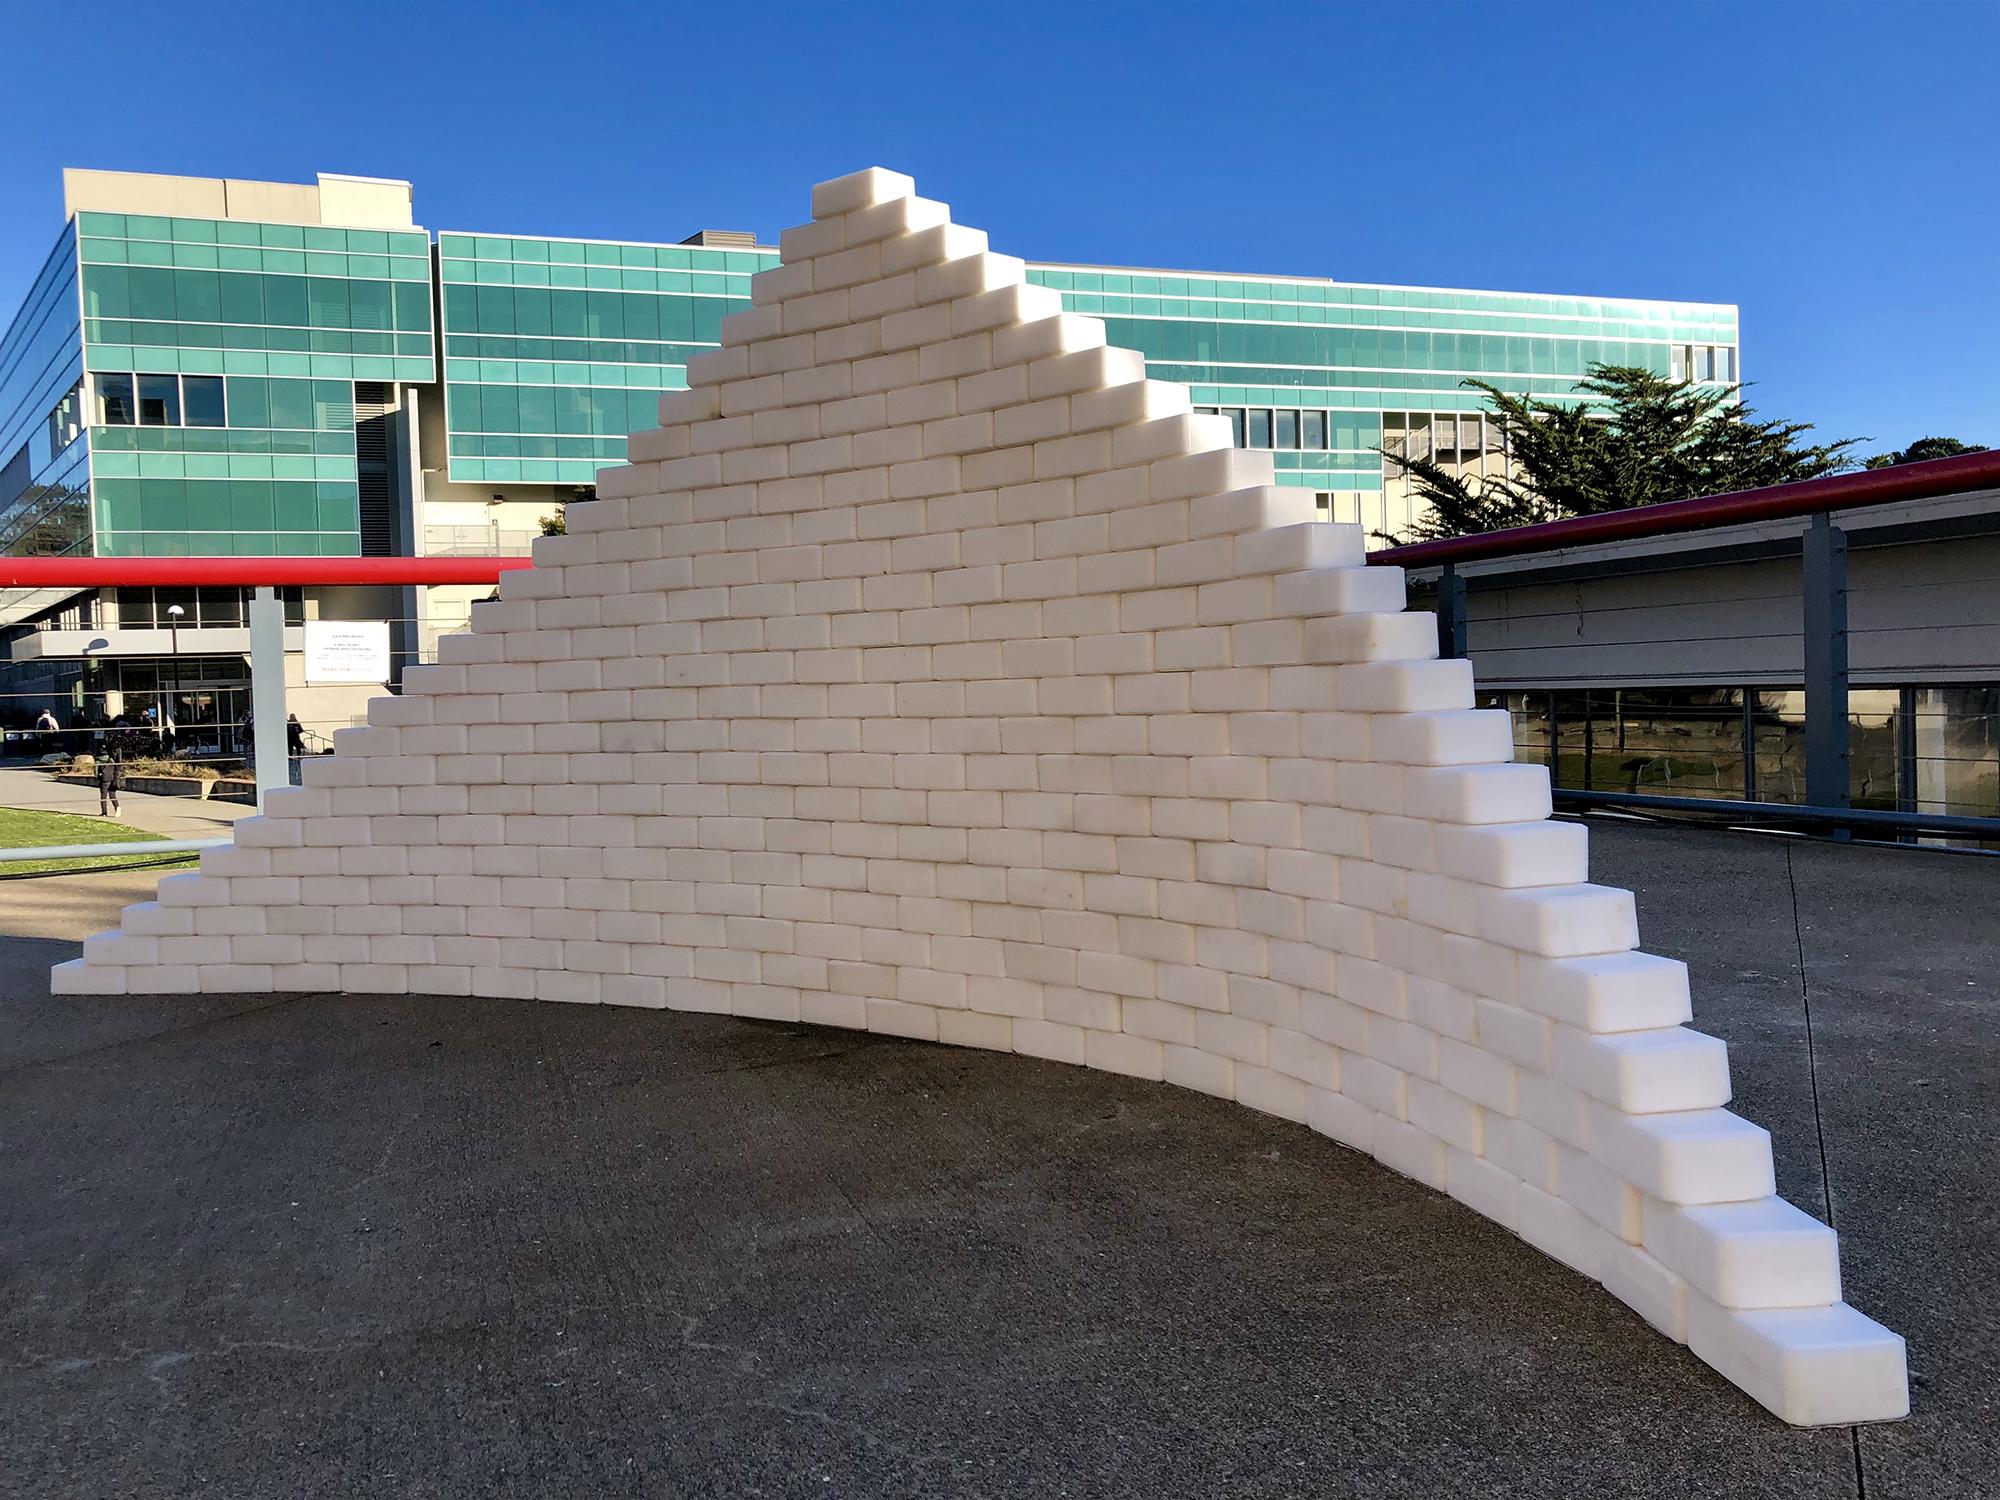 Pinkusevich Salt Wall 10x 5ft 2019.jpg